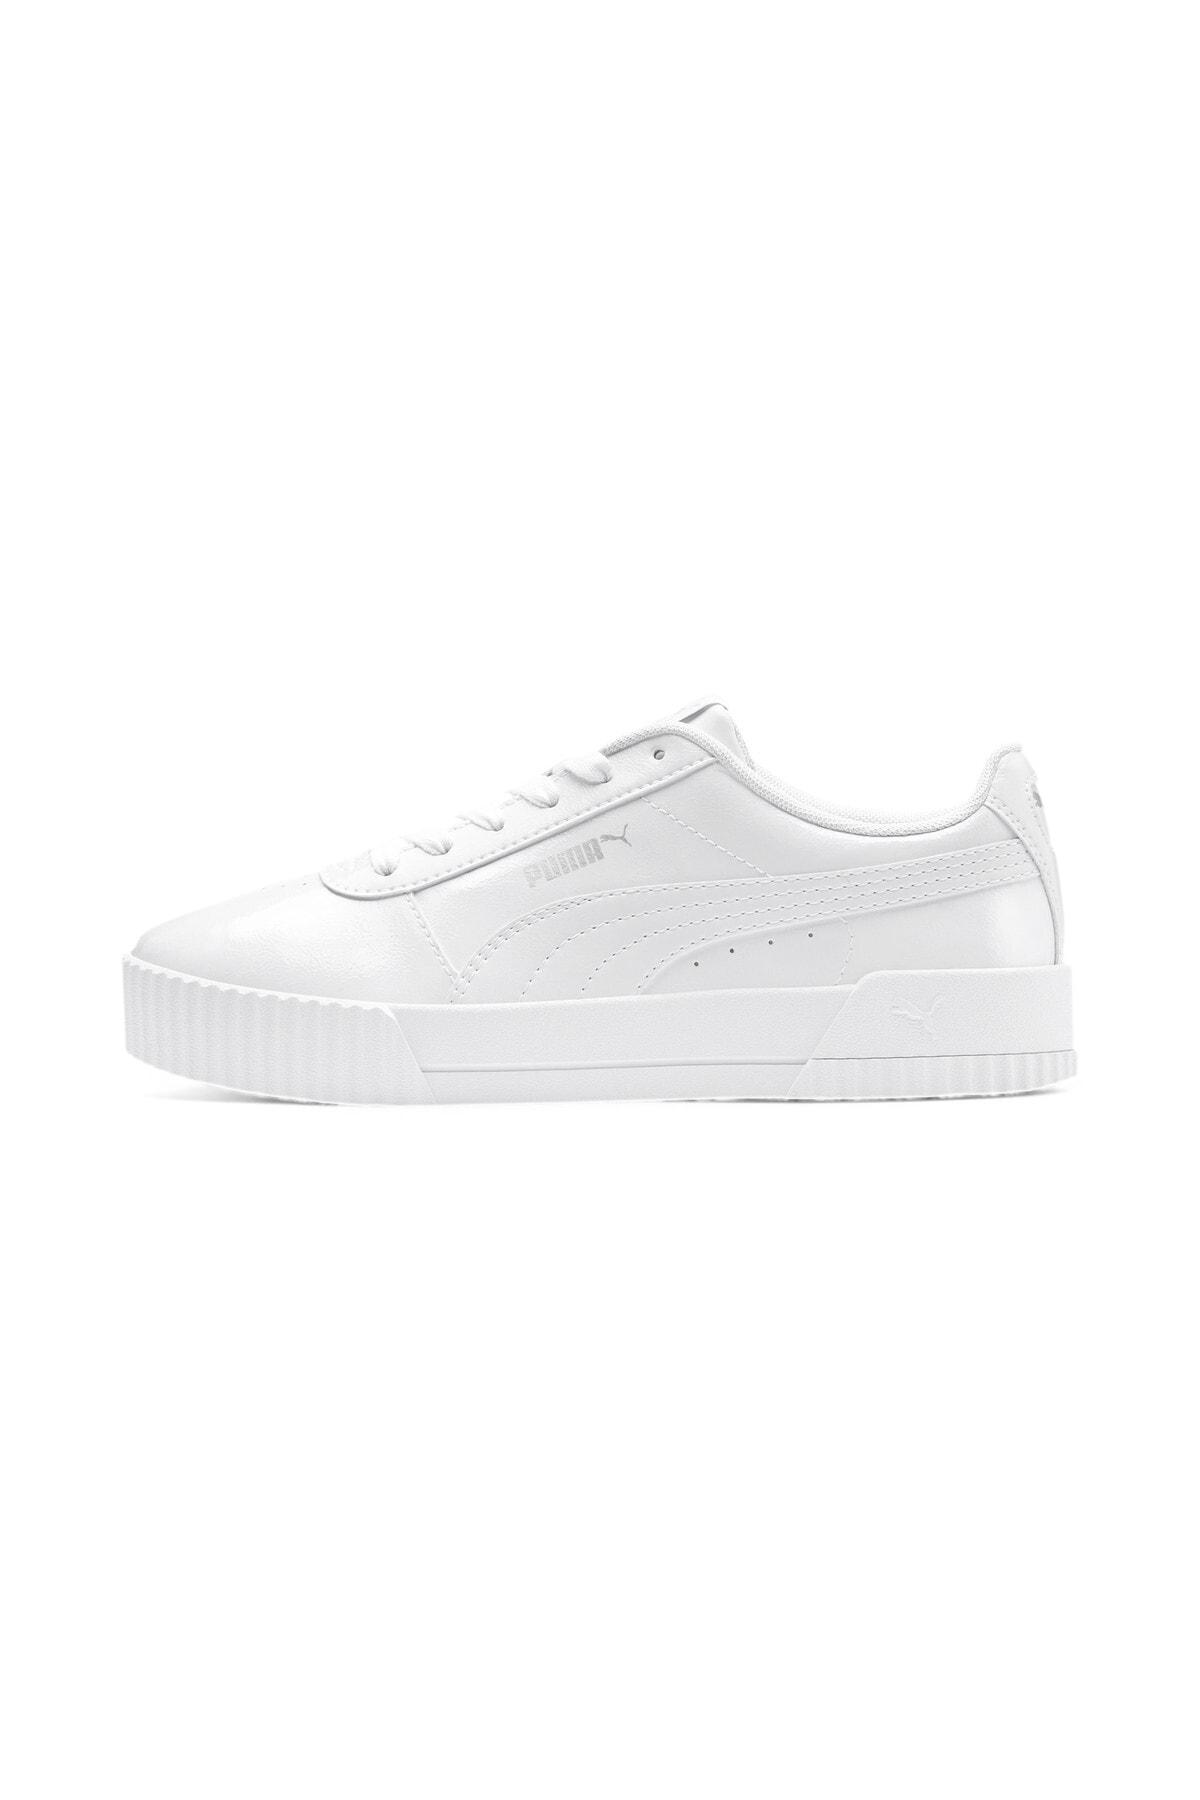 Puma Kadın Sneaker - CARINA P - 37091202